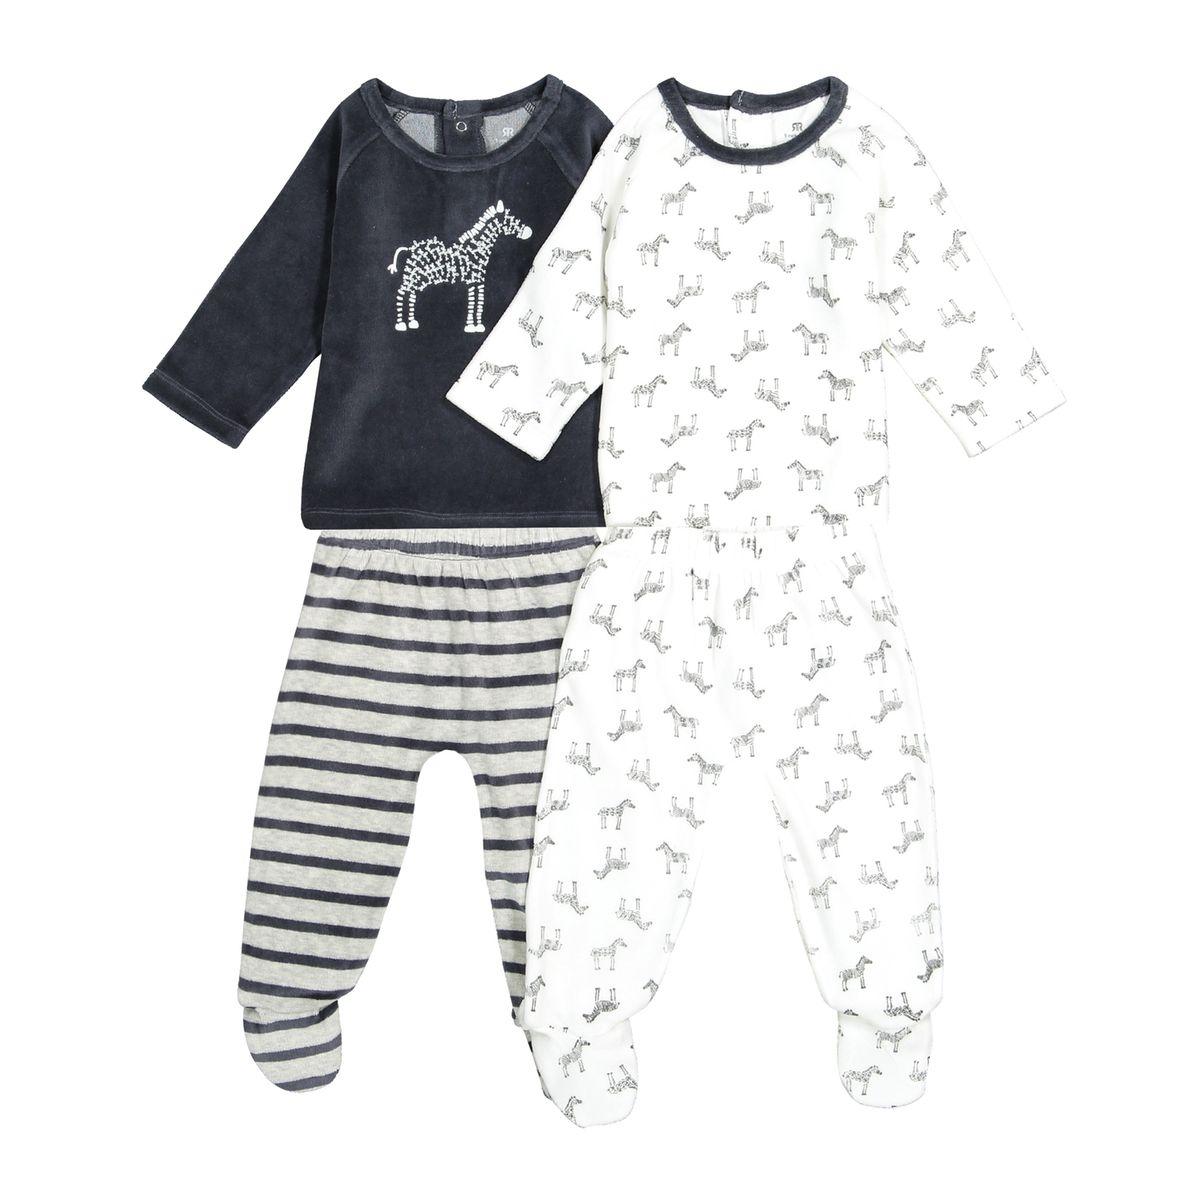 f0c66d29a890e Pyjama imprimé animal 𝗽𝗮𝘀 𝗰𝗵𝗲𝗿 - Mes Fringues